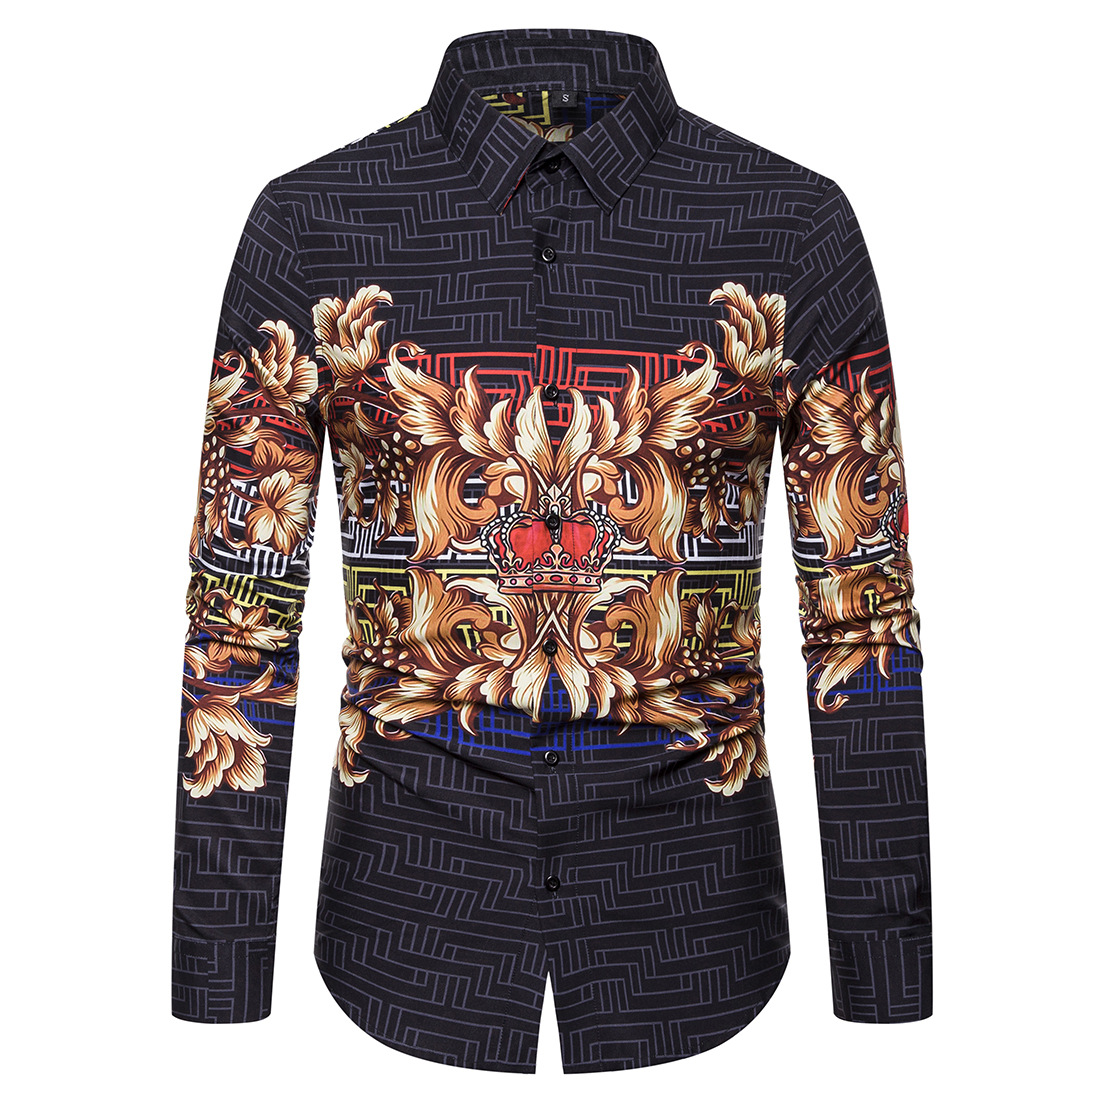 Autumn New Style Casual Trend Long-sleeved Shirt Men Ouma Digital Printing Shirt Ys013